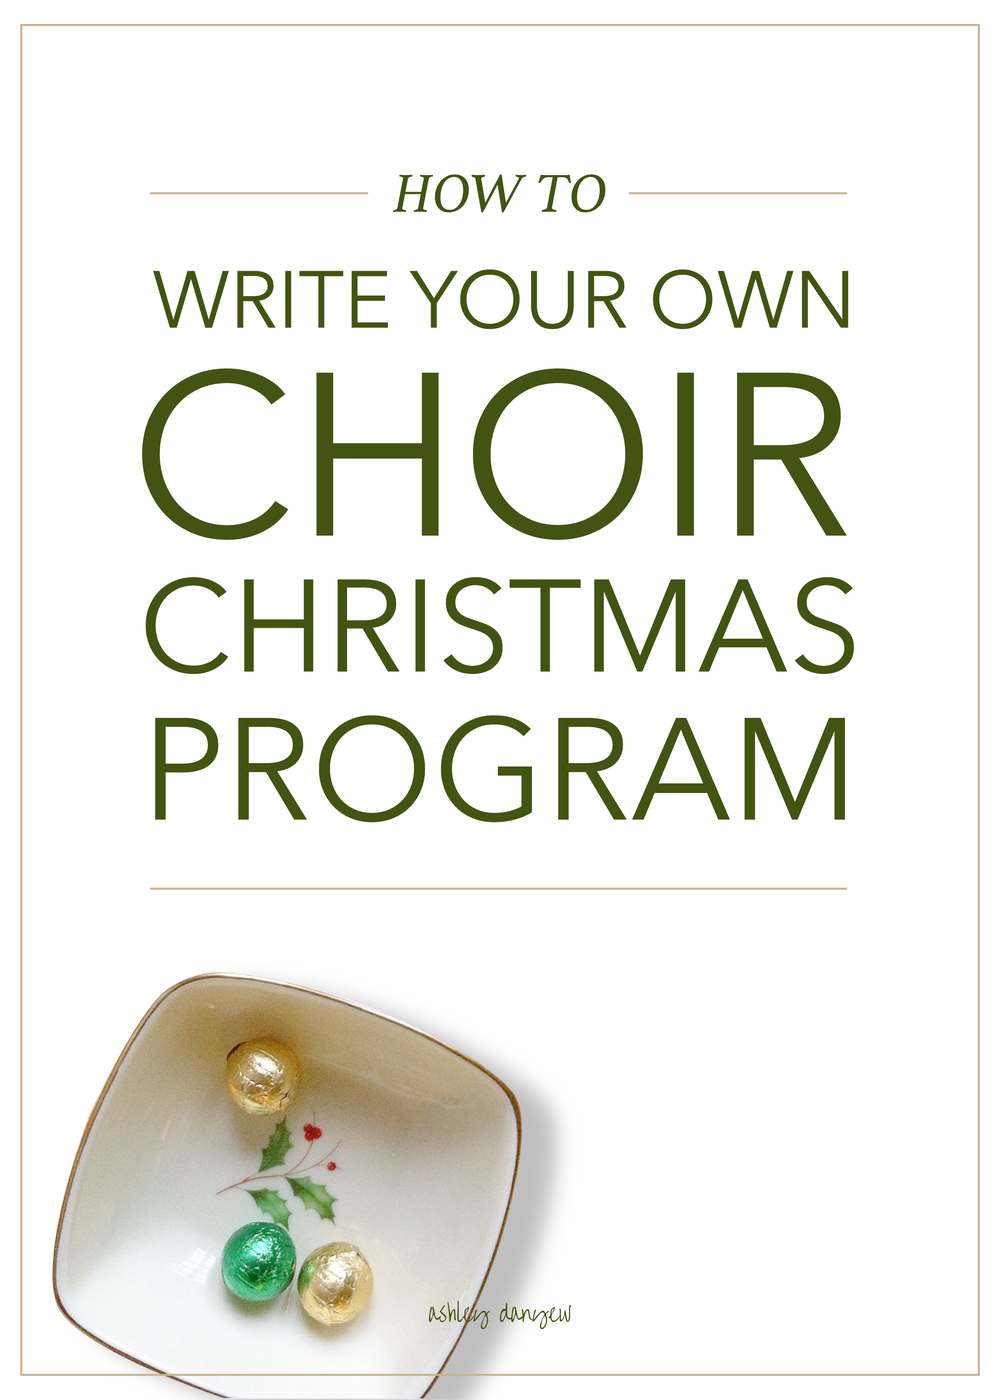 Copy of How to Write Your Own Choir Christmas Program